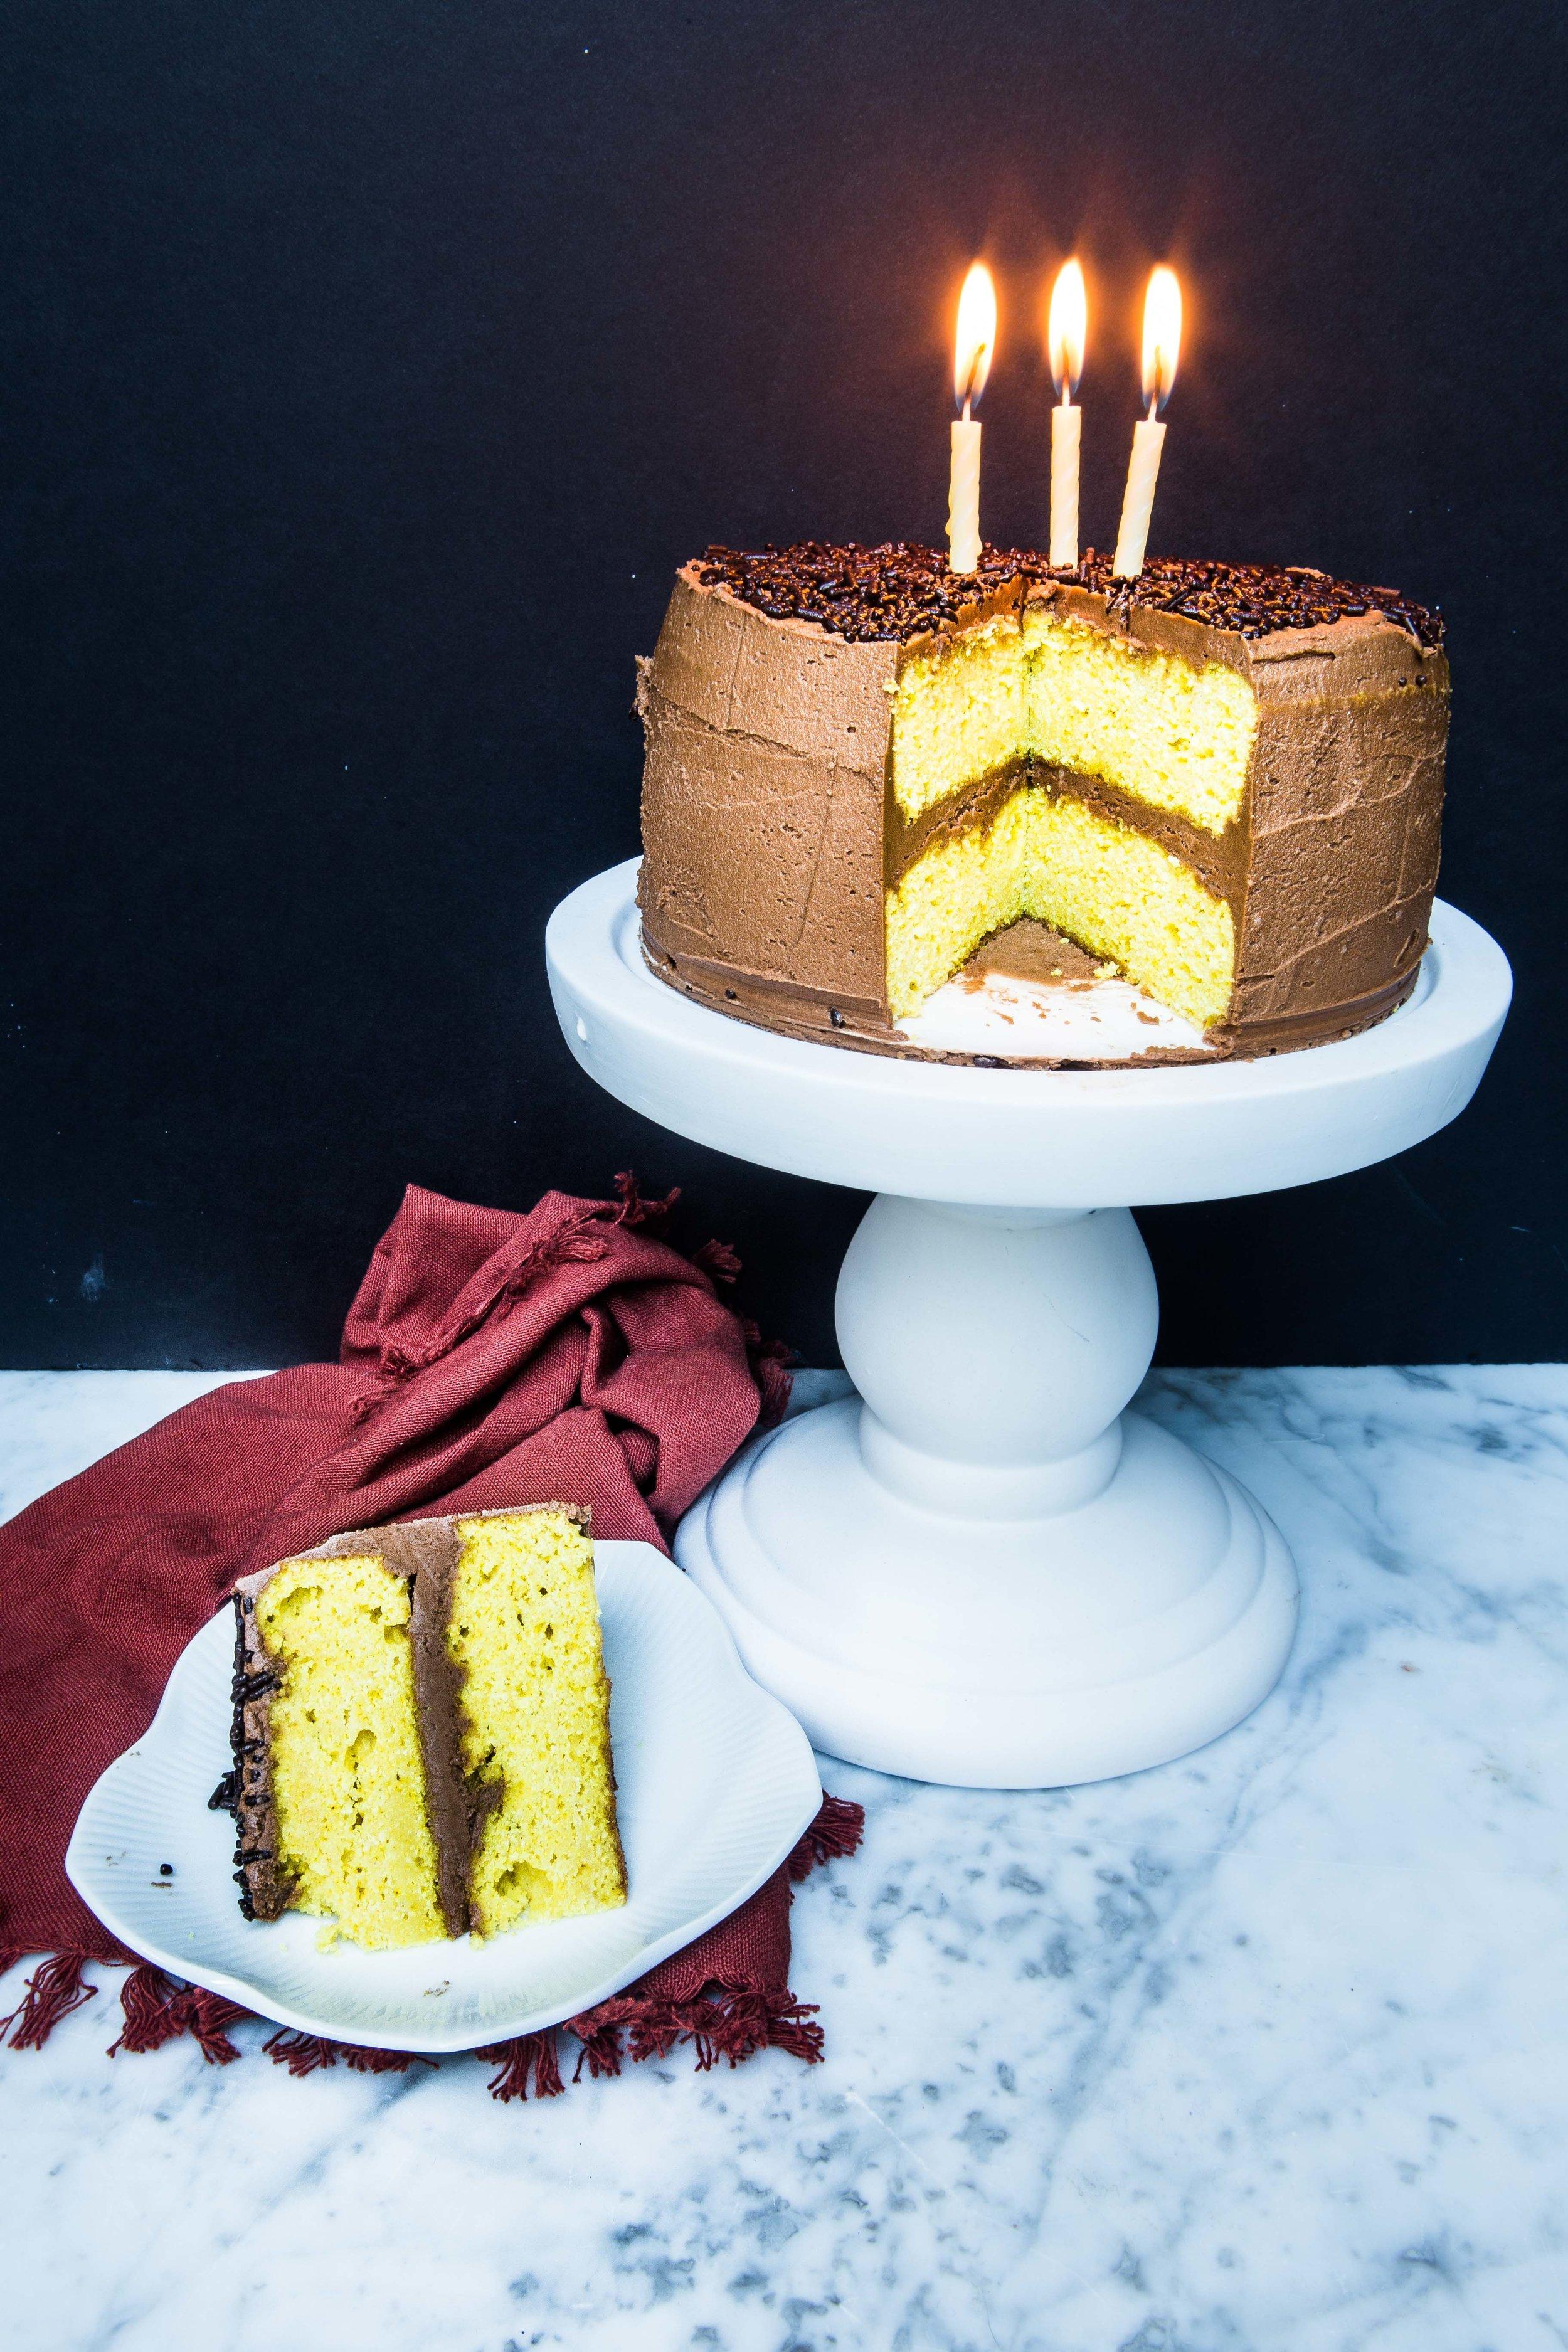 Cake examples 4.jpg